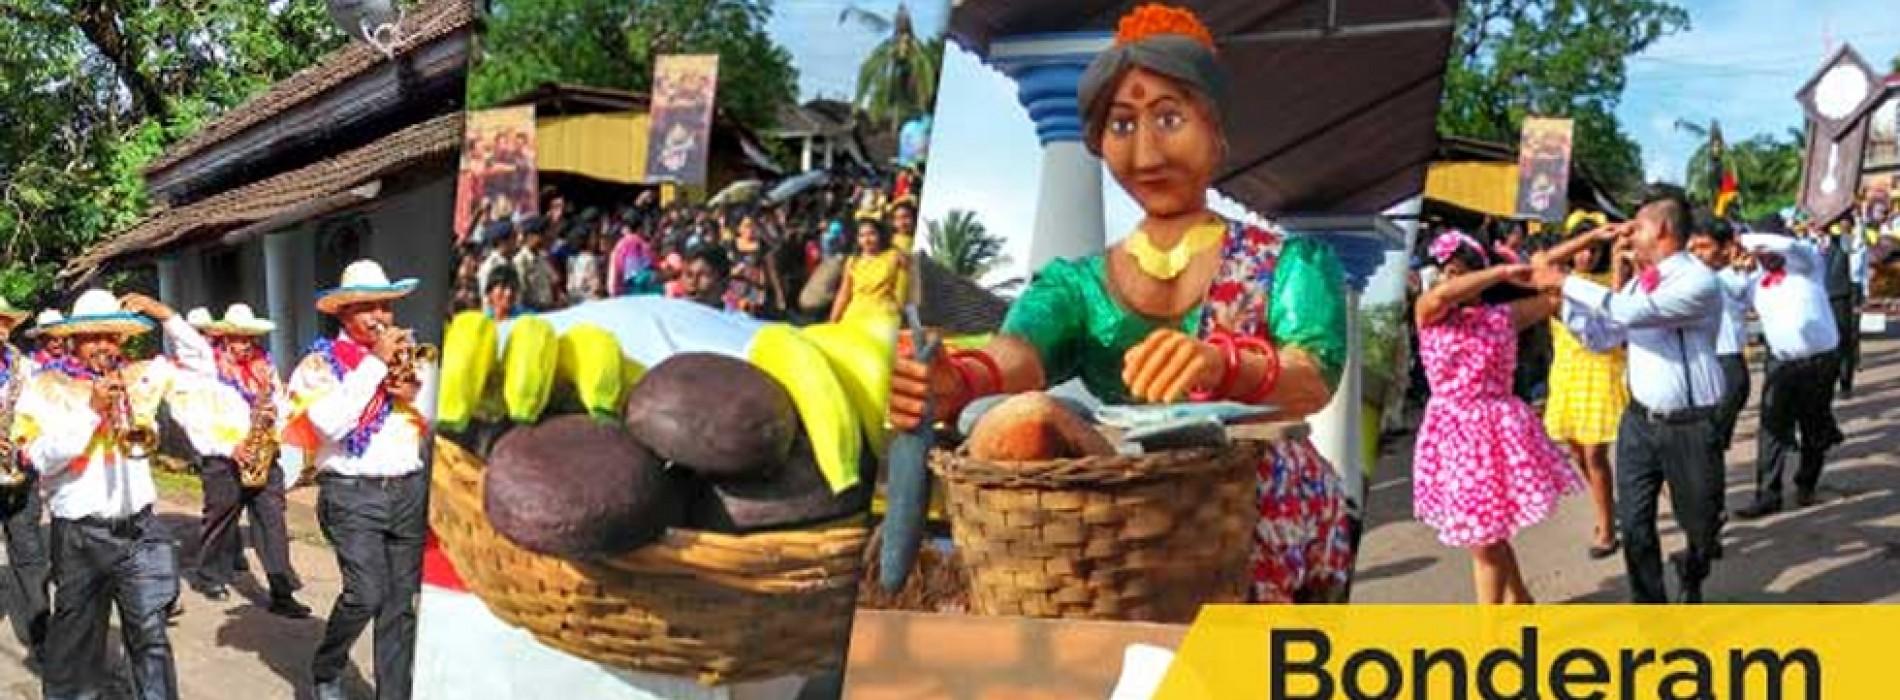 Goa all set to celebrate Bonderam